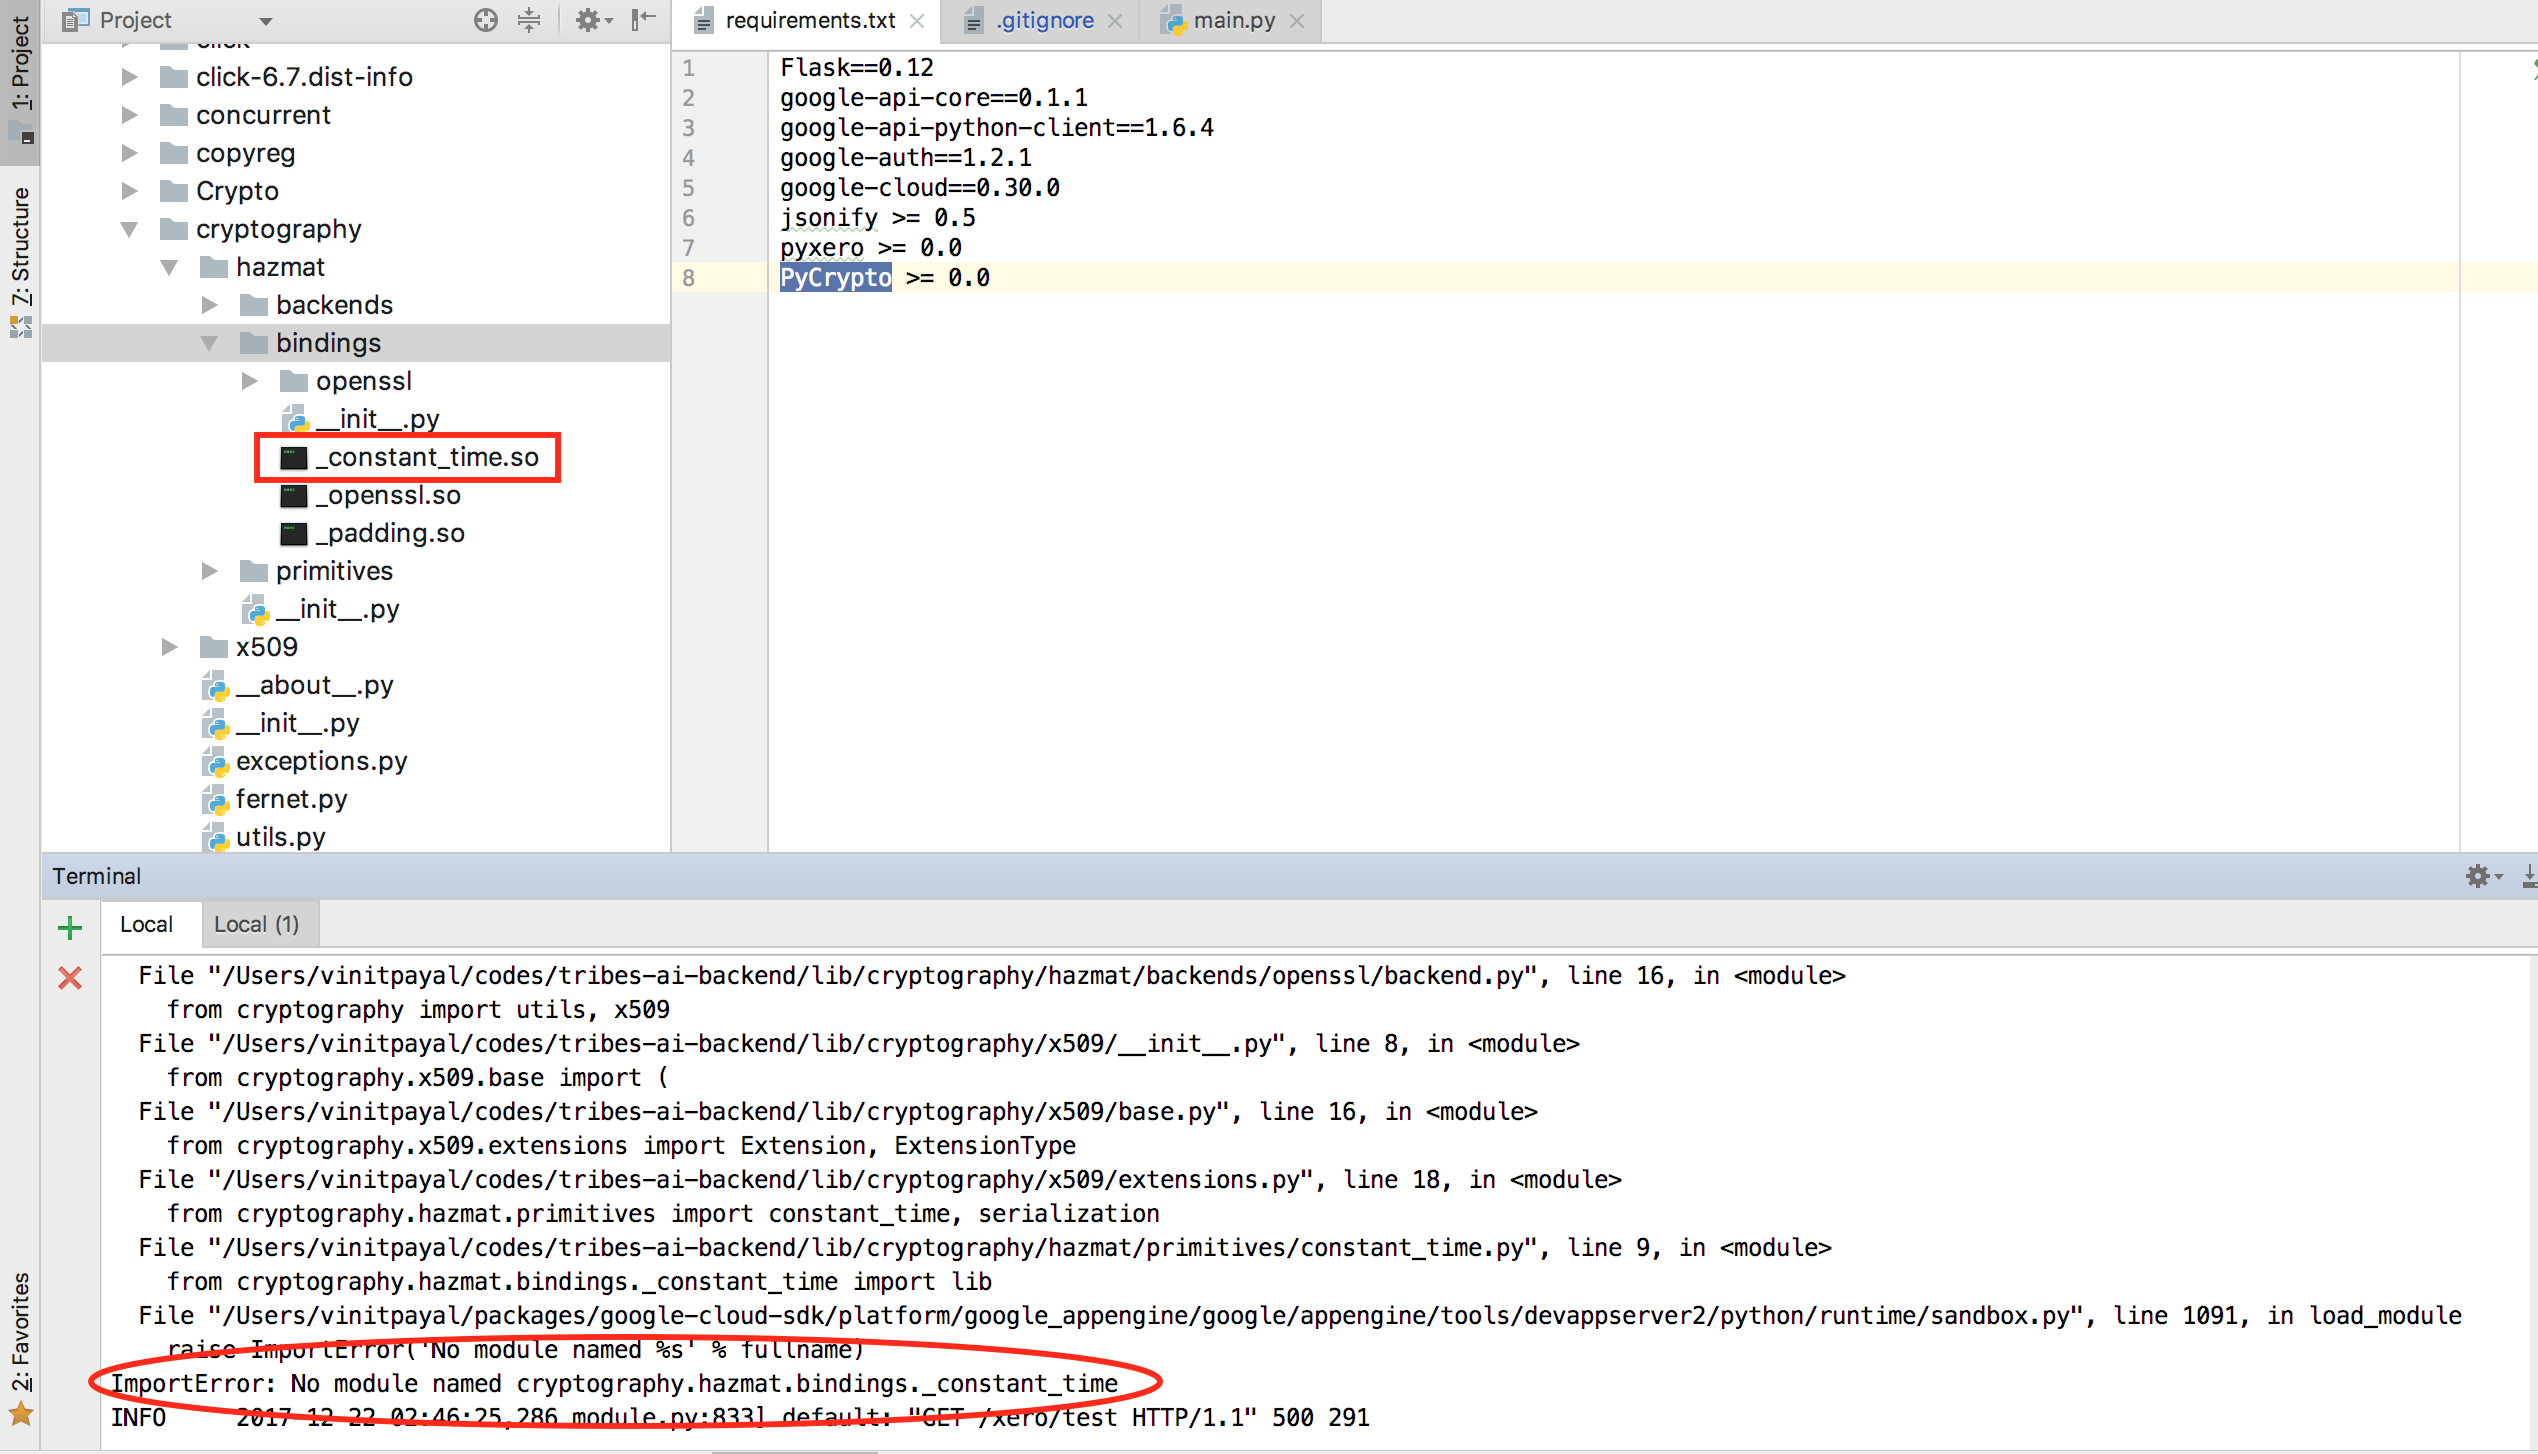 ImportError: No module named cryptography hazmat bindings